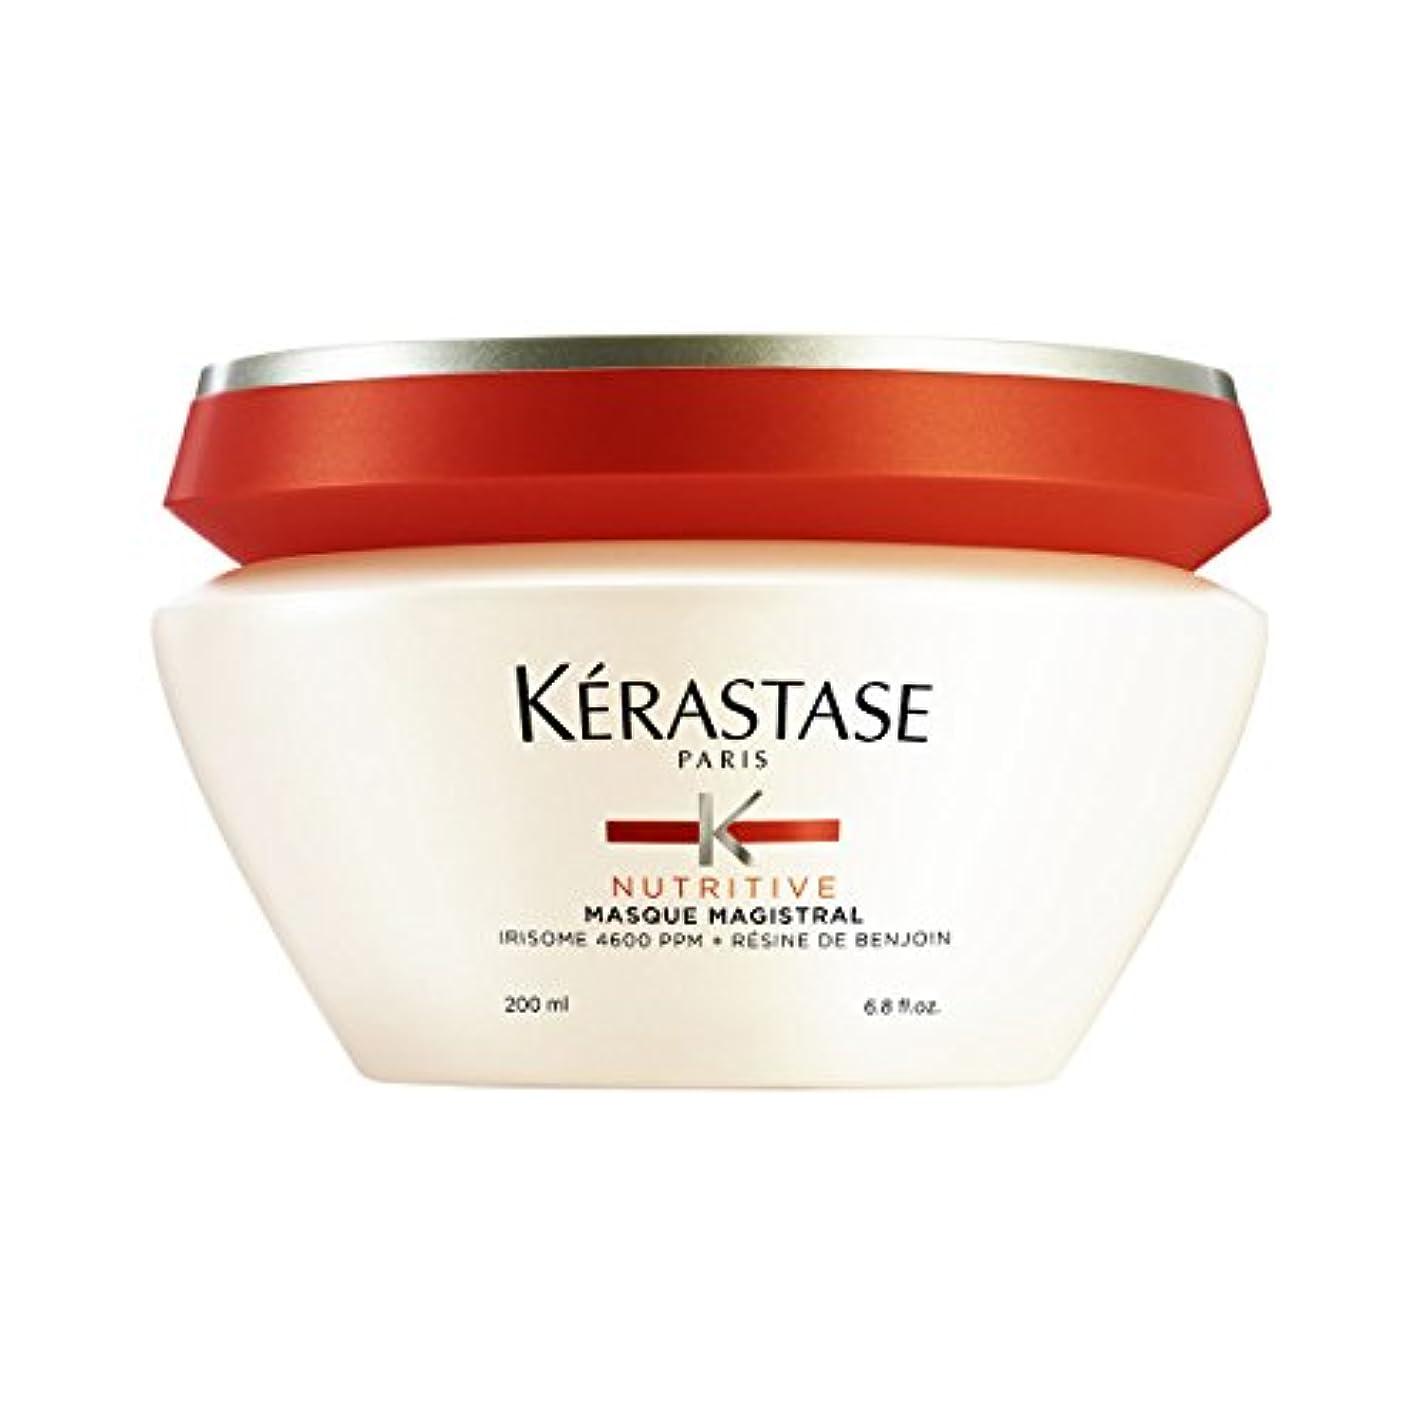 太鼓腹九月格納K駻astase Nutritive Masque Magistral Hair Mask 200ml [並行輸入品]